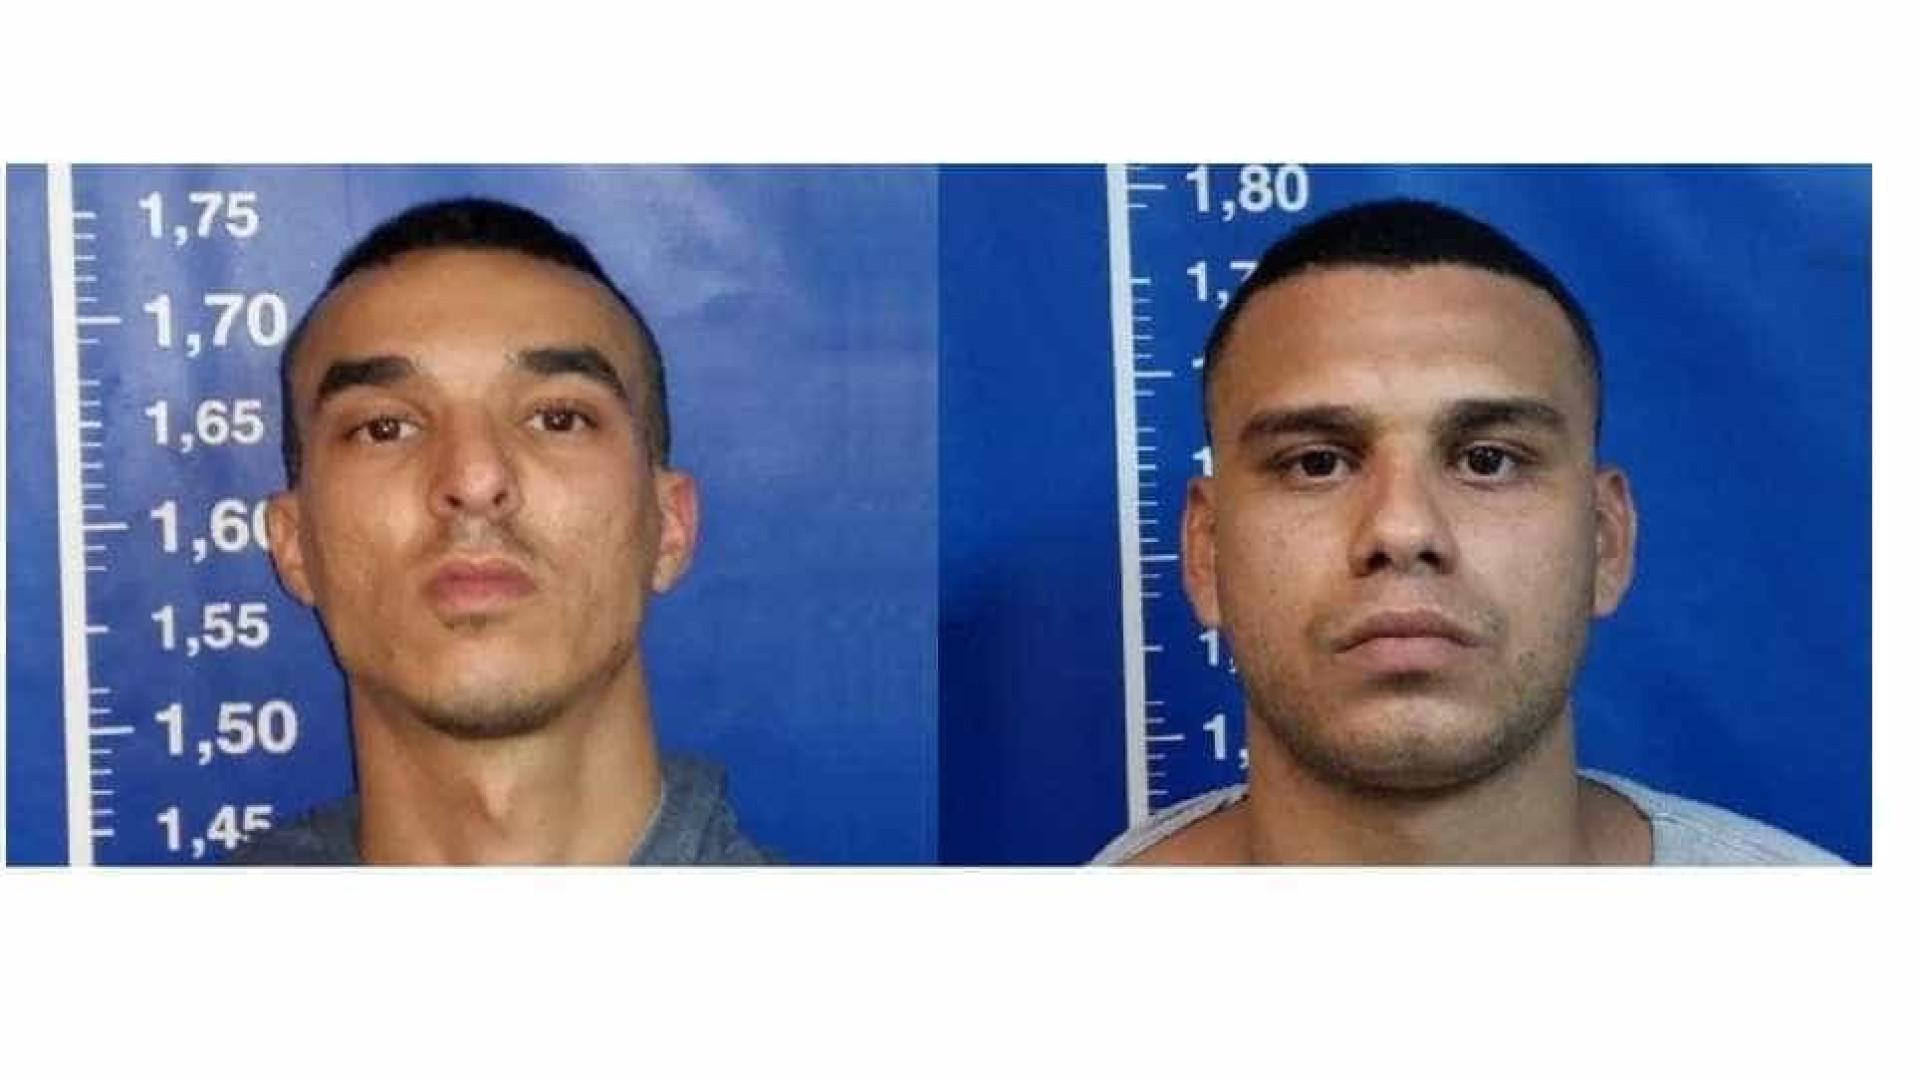 Polícia prende membros de quadrilha que roubou carga de queijos